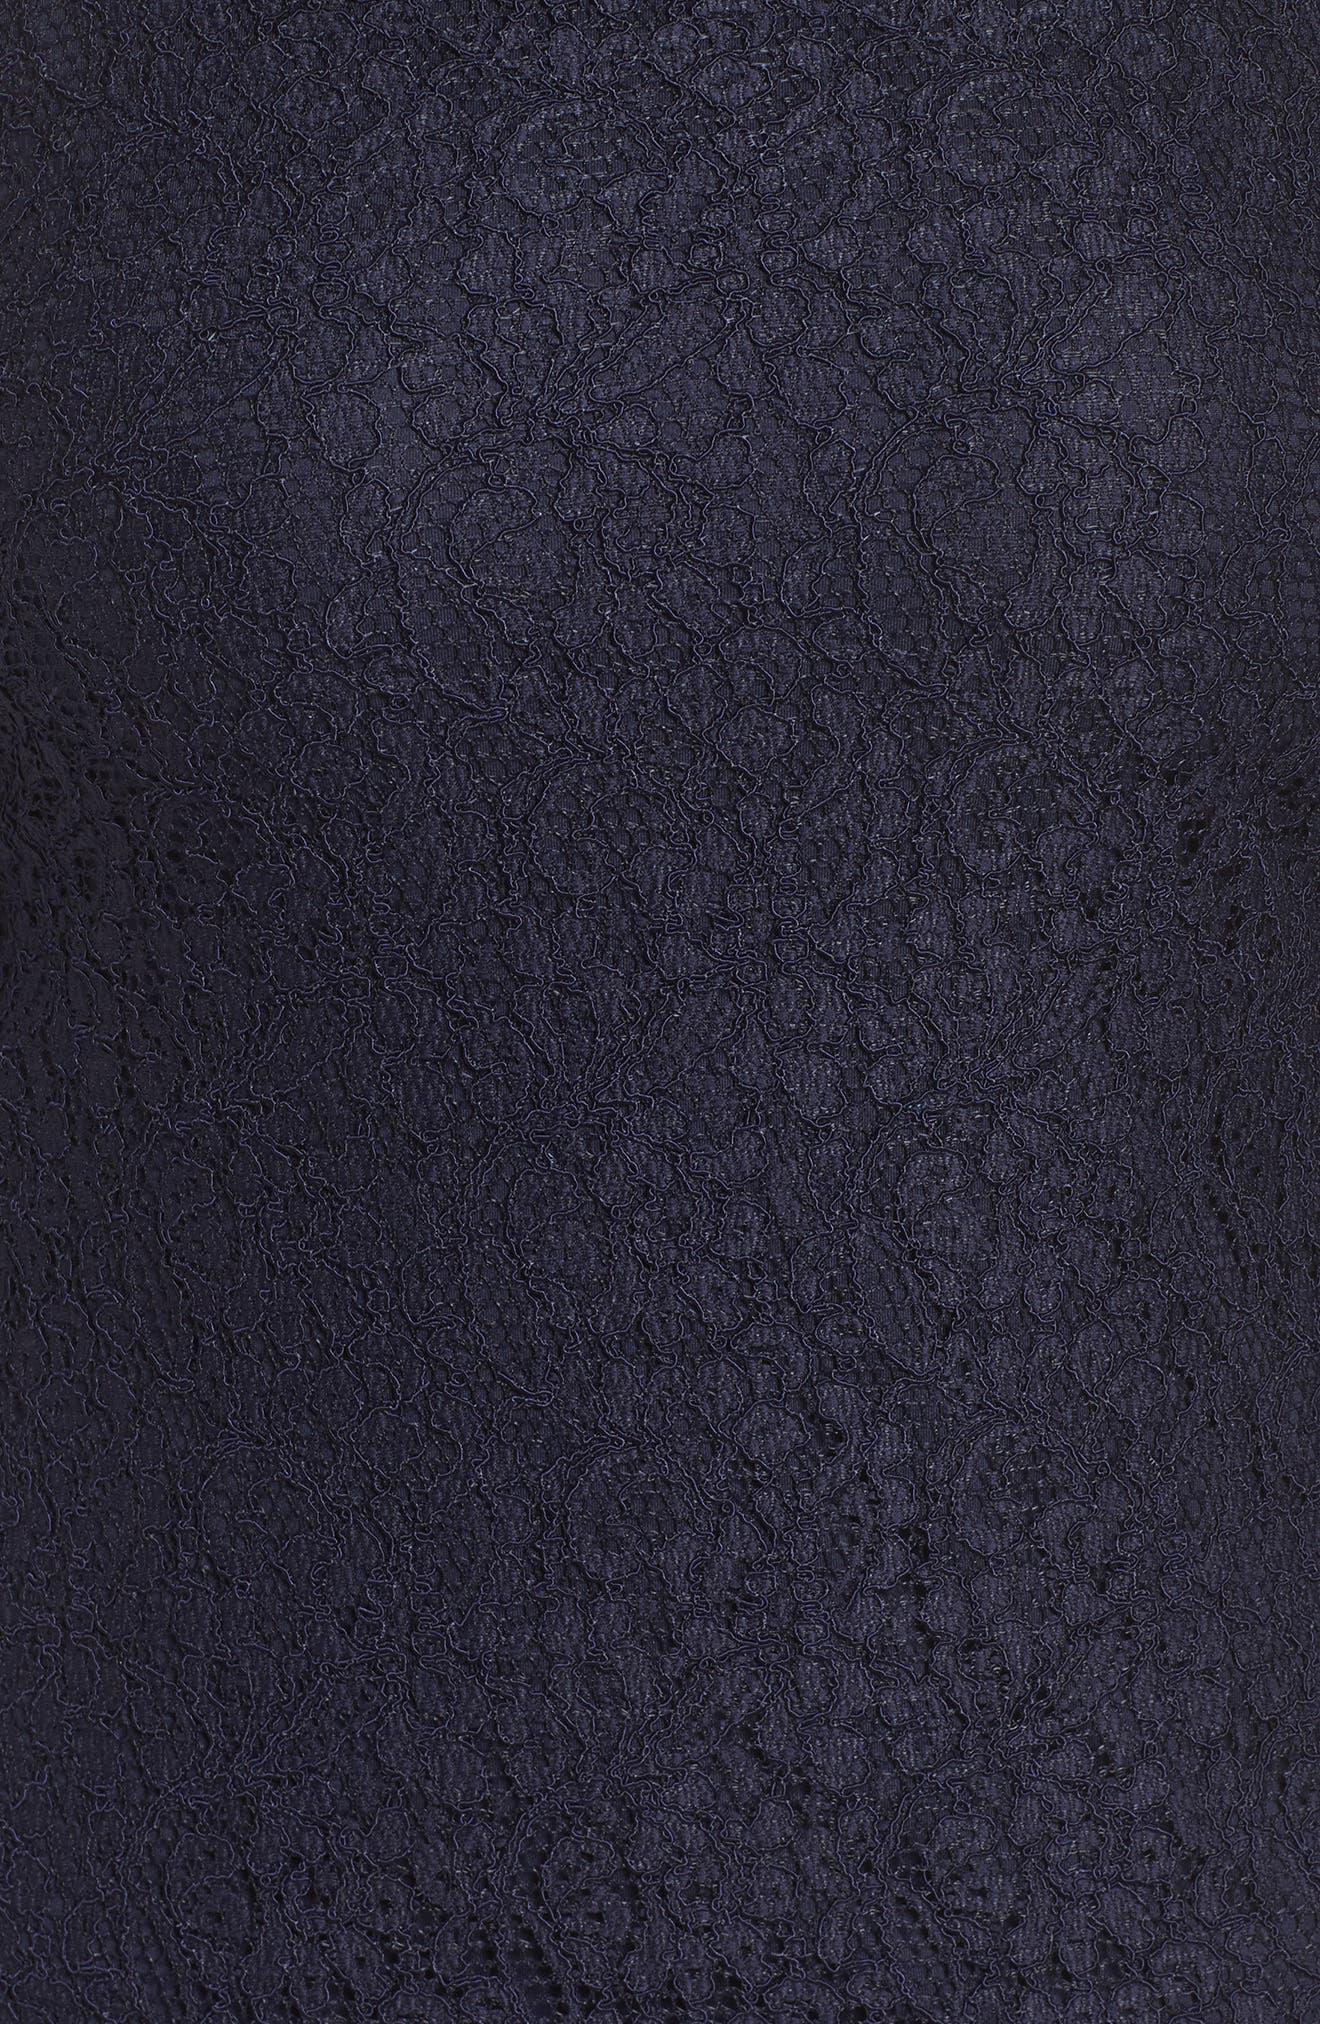 Lace Overlay Sheath Dress,                             Alternate thumbnail 5, color,                             Navy